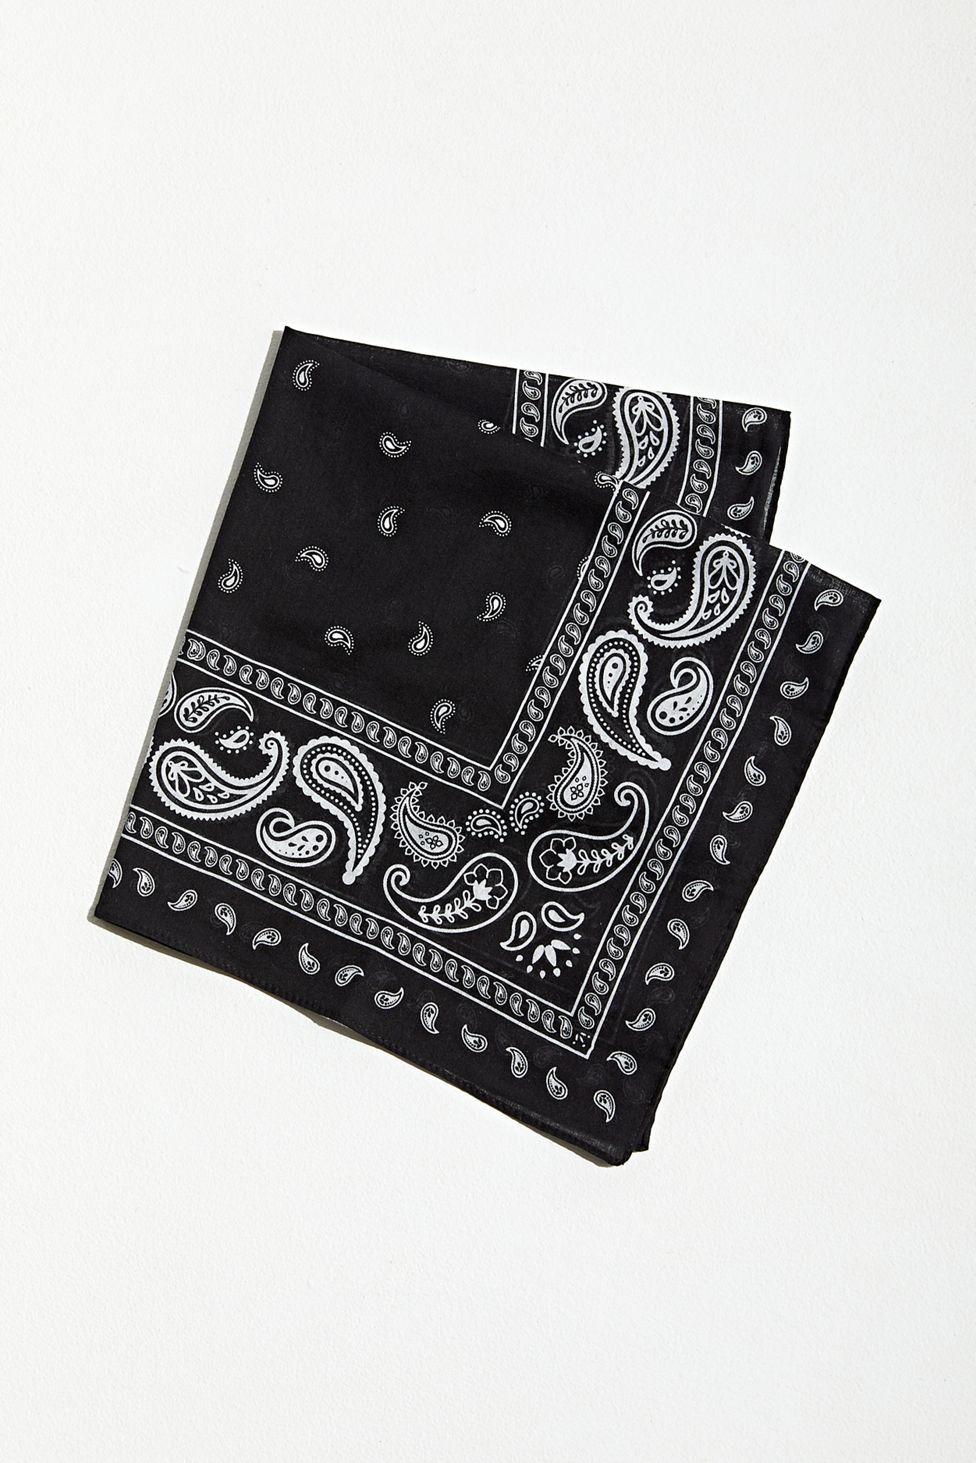 Urban Outfitters Bandana - cool bandanas for men